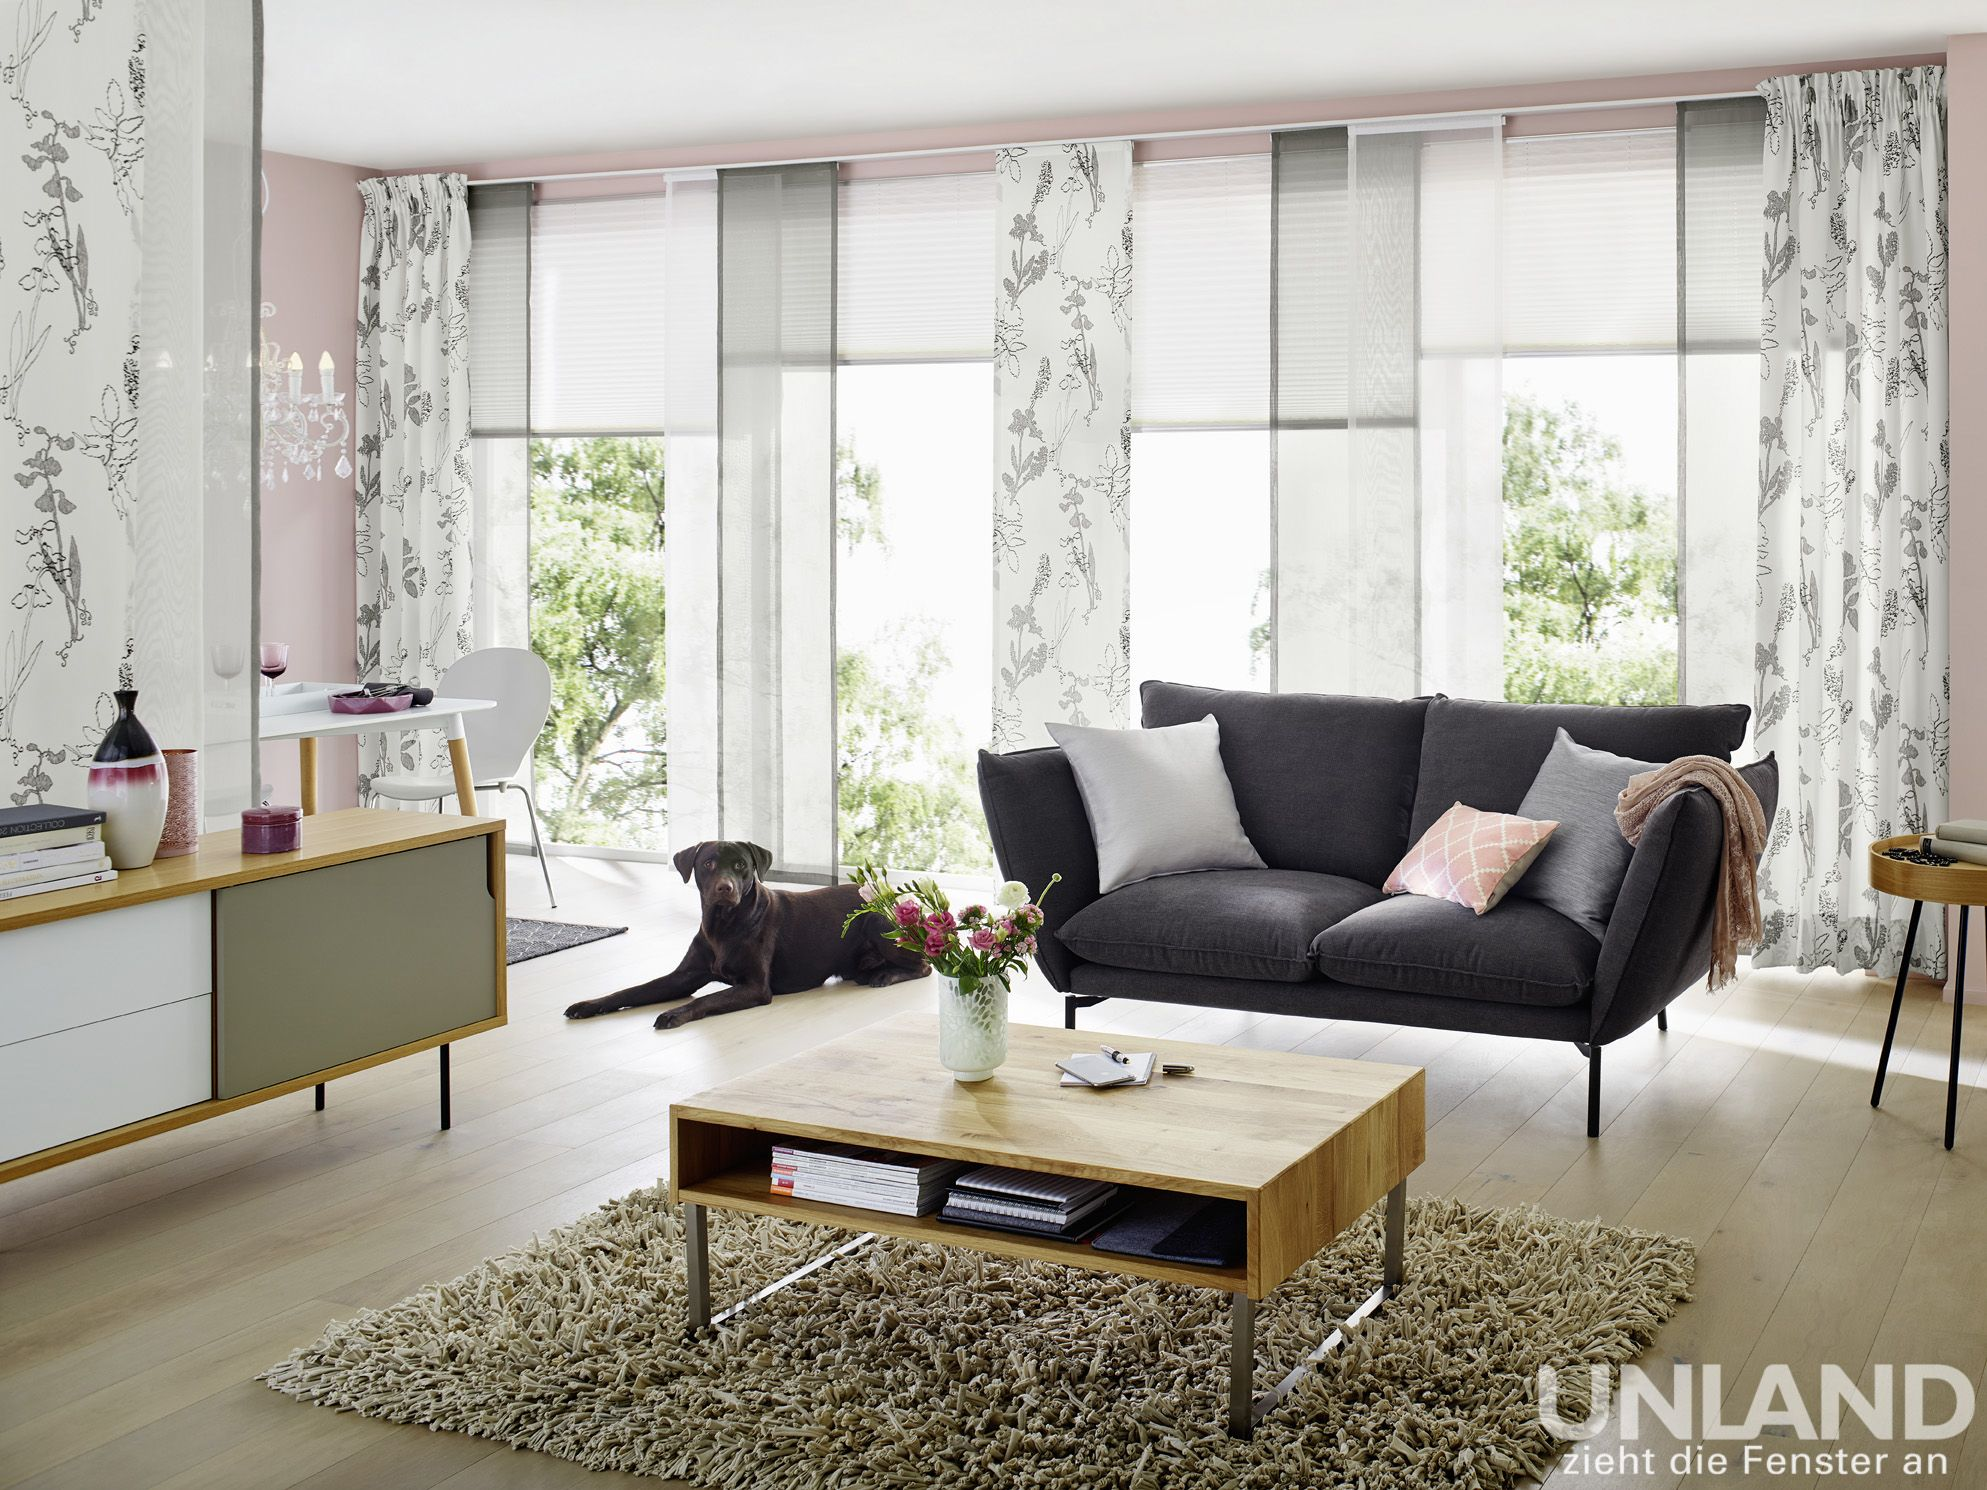 fenster botanic gardinen dekostoffe vorhang wohnstoffe plissees rollos jalousien. Black Bedroom Furniture Sets. Home Design Ideas